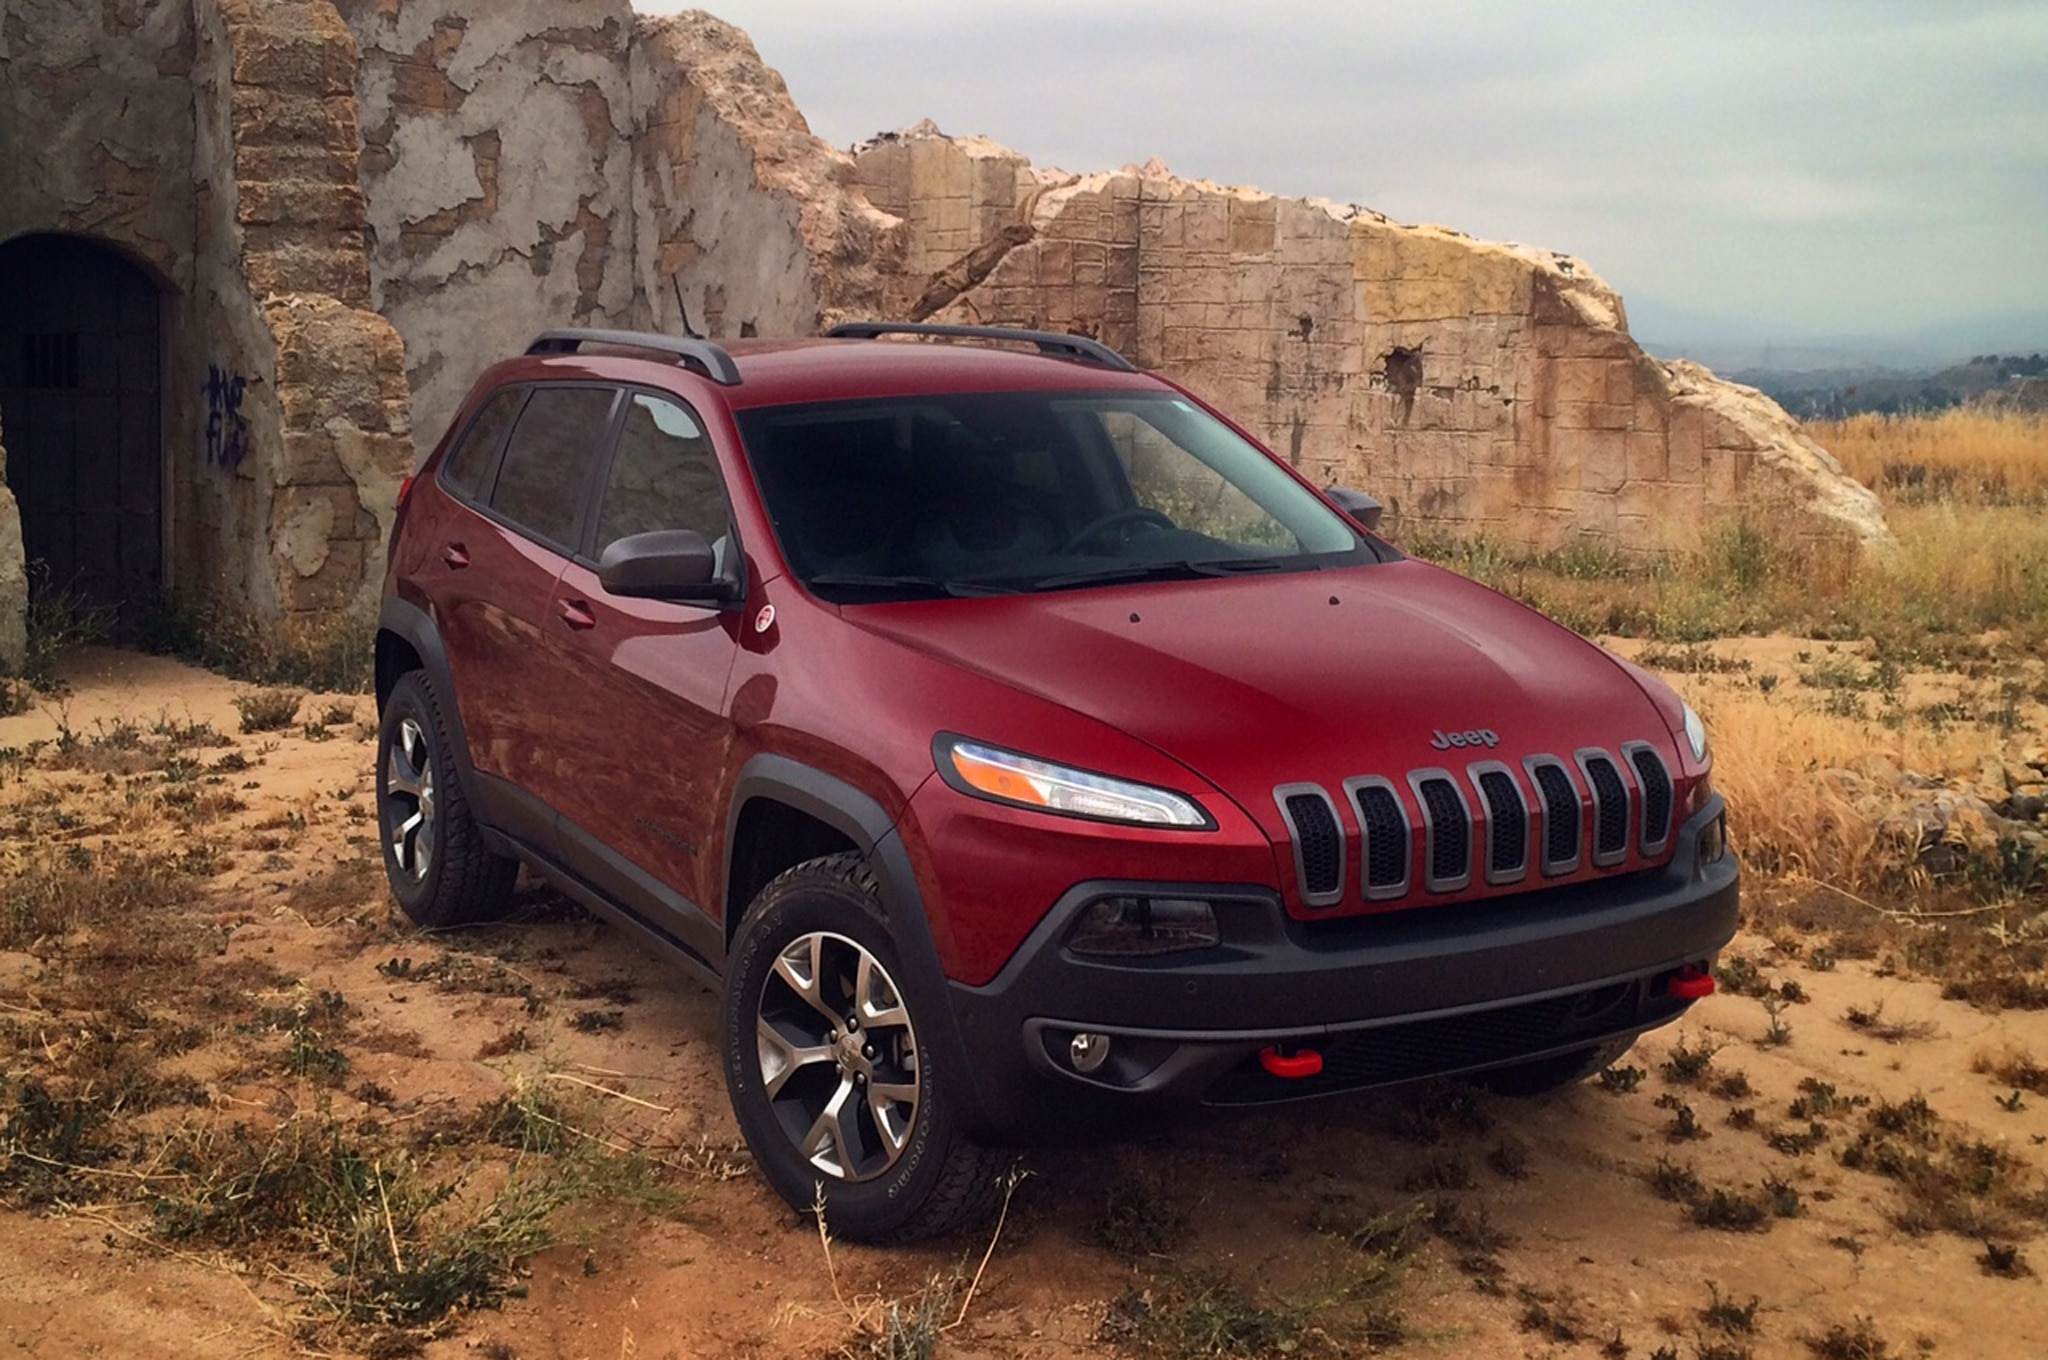 2014 Jeep Cherokee Trailhawk Front Three Quarters